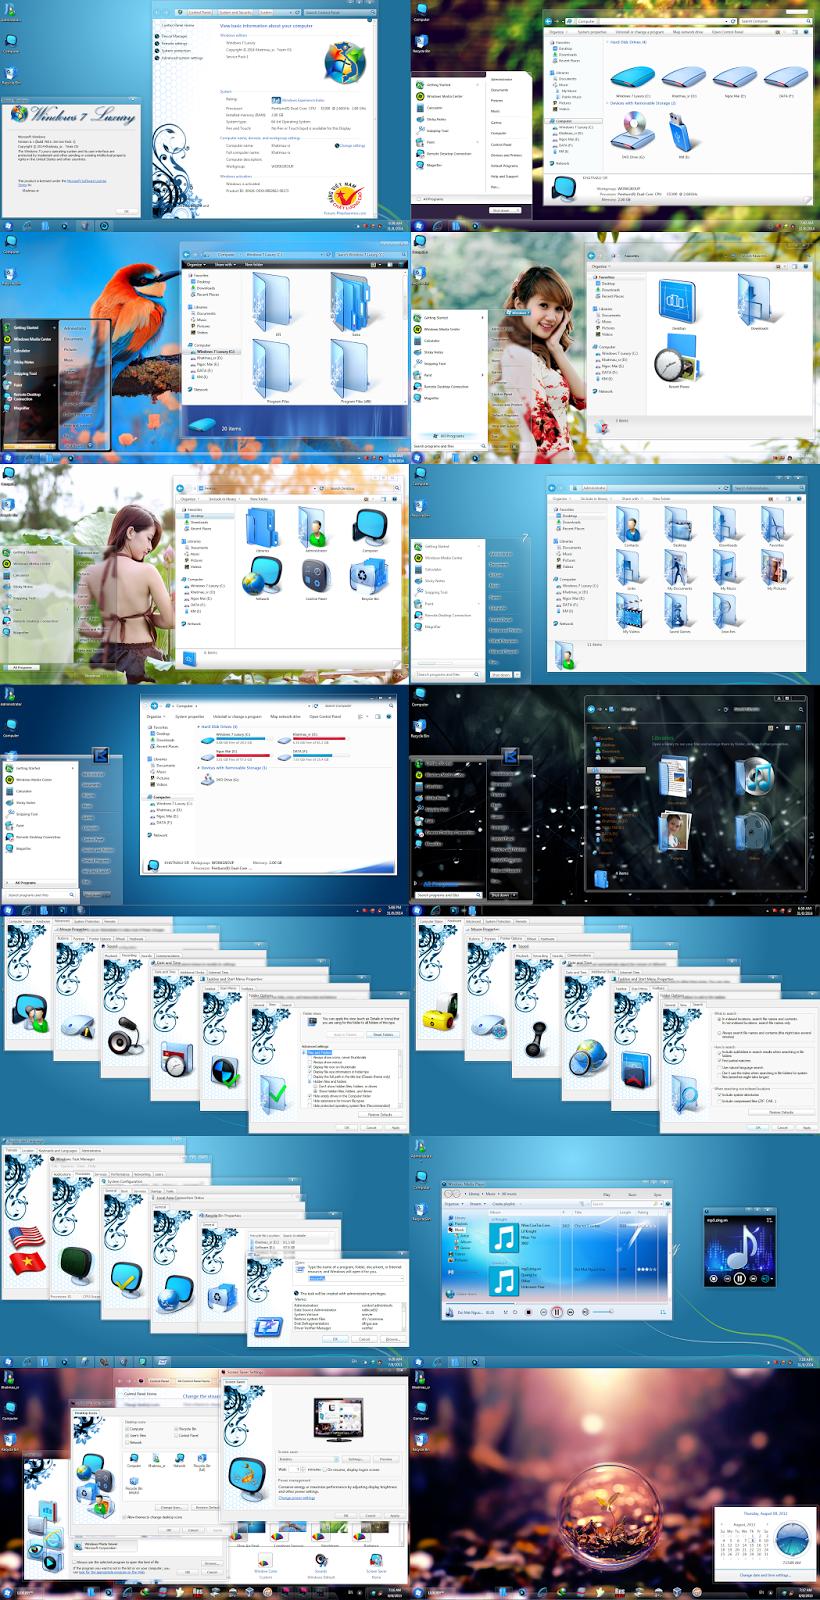 download ie11 windows 7 embedded standard